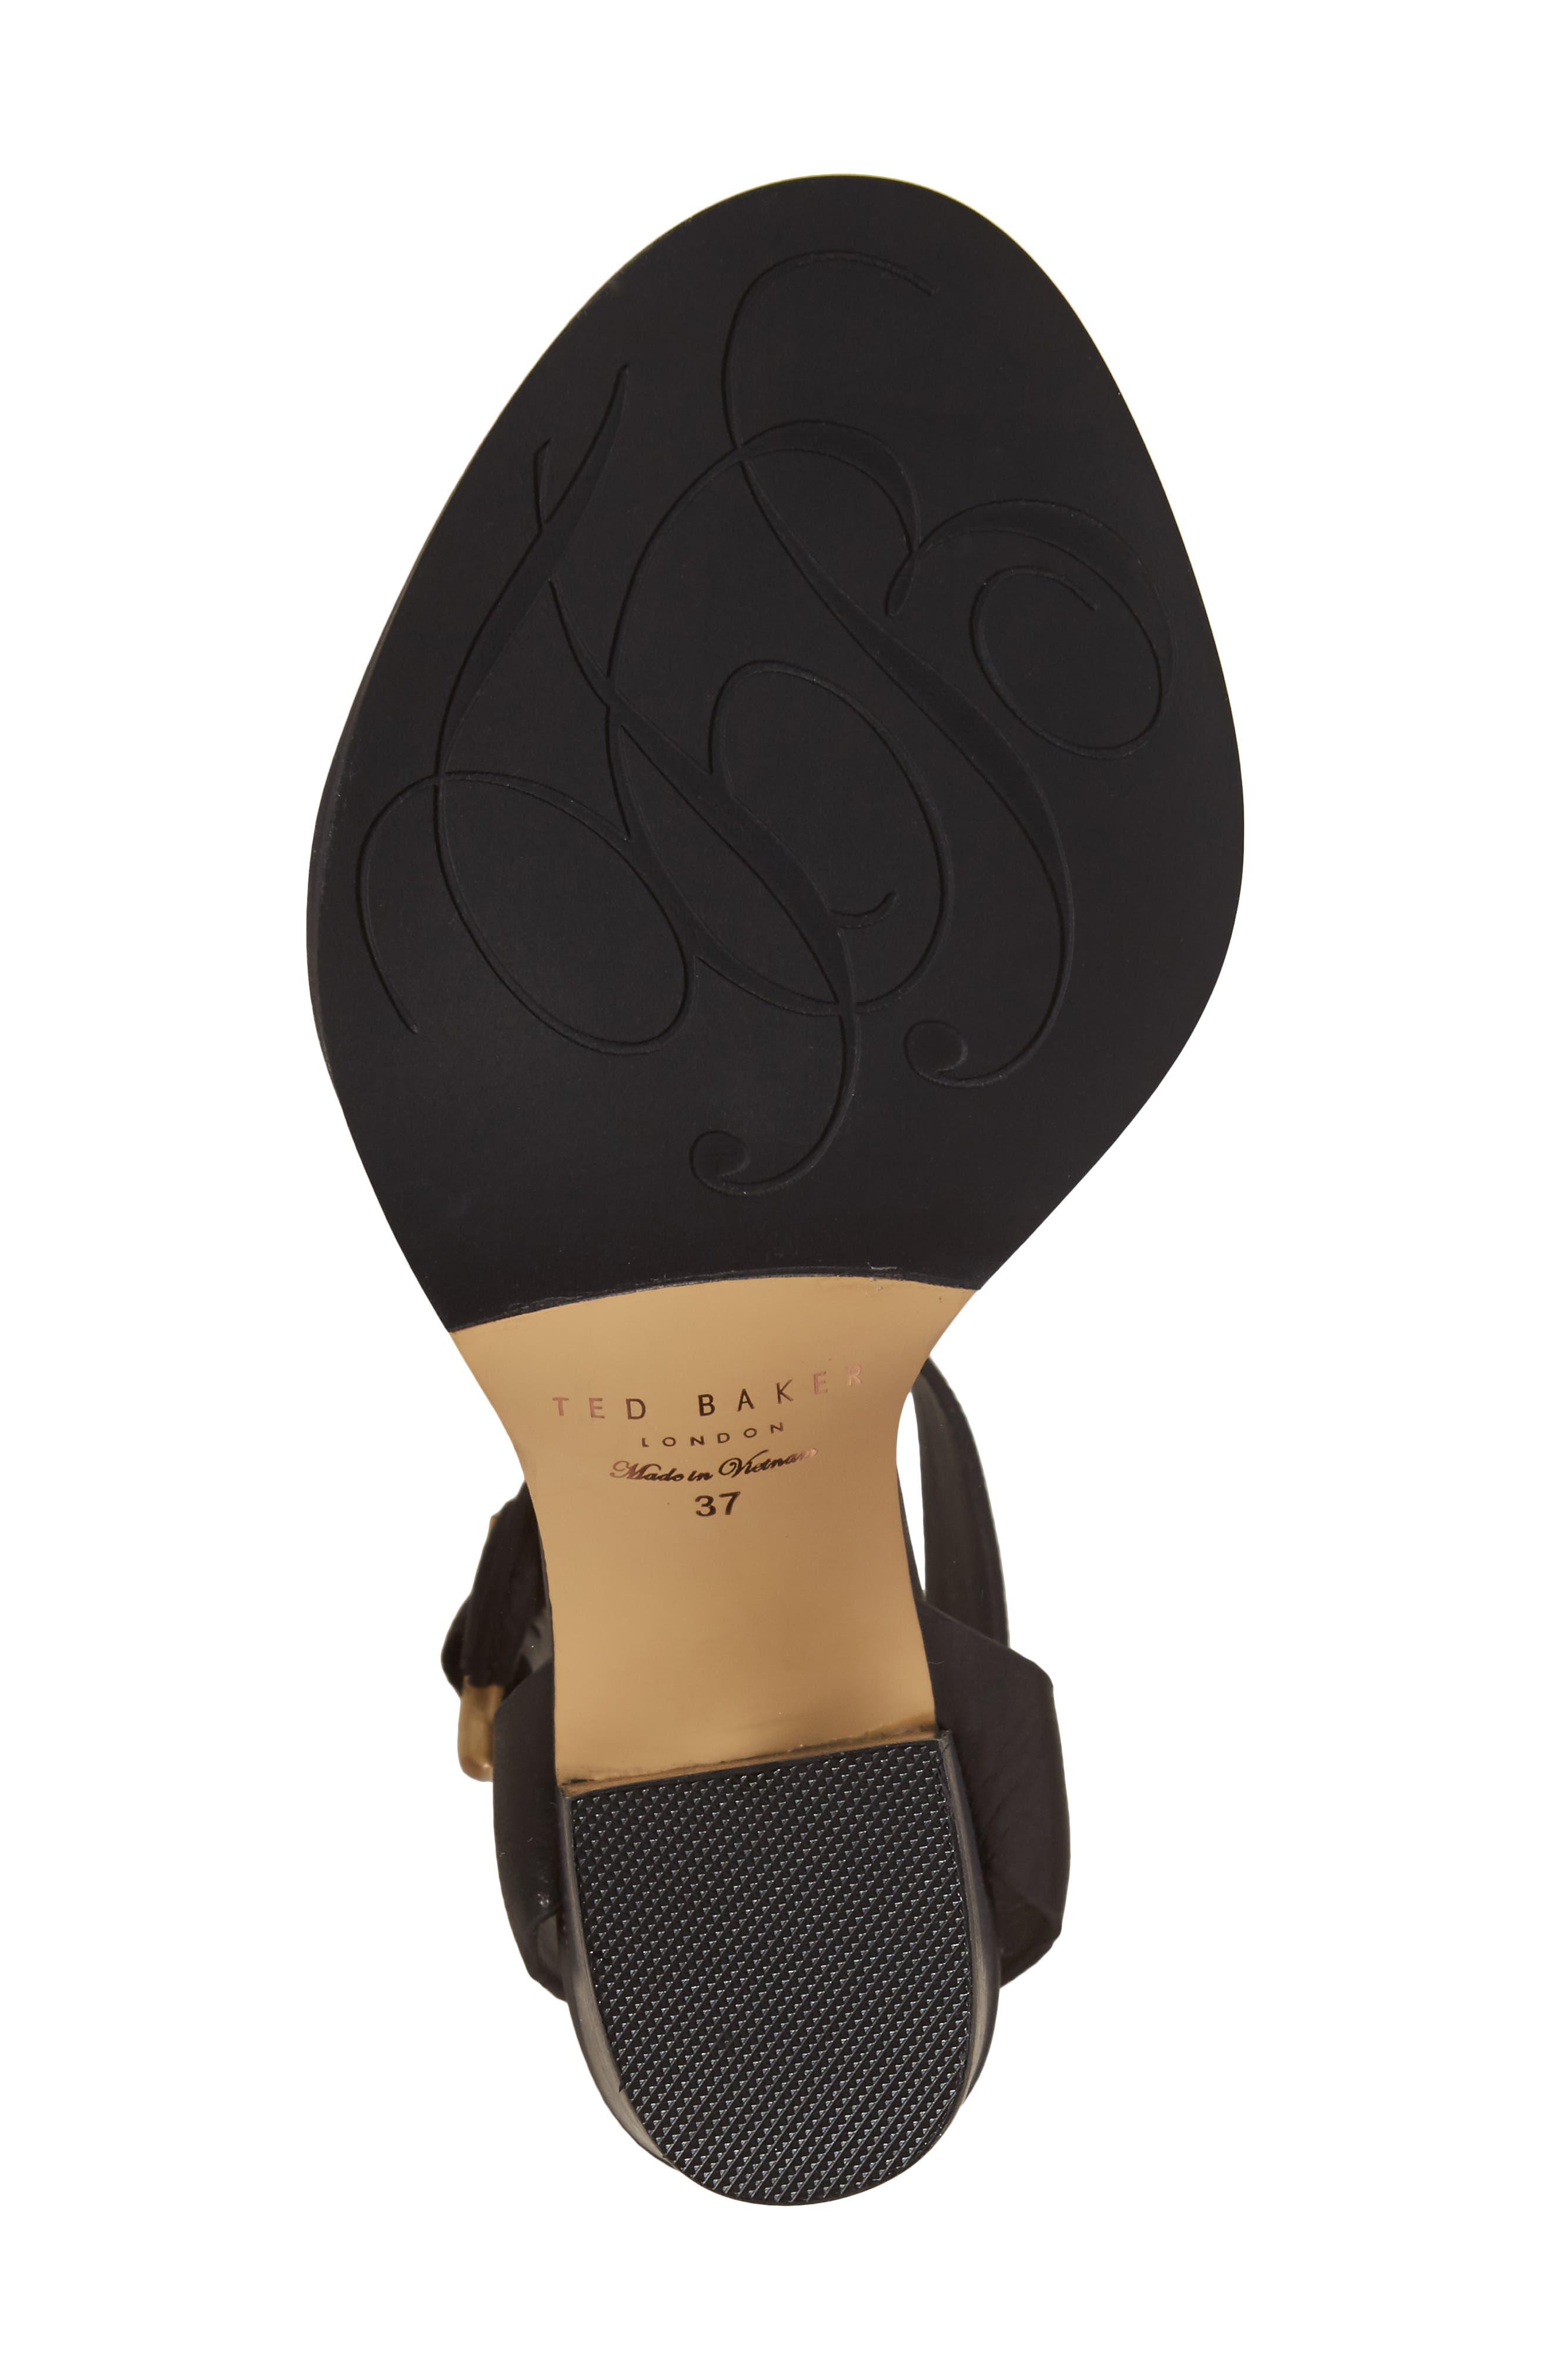 Betciy Ankle Strap Sandal,                             Alternate thumbnail 6, color,                             001